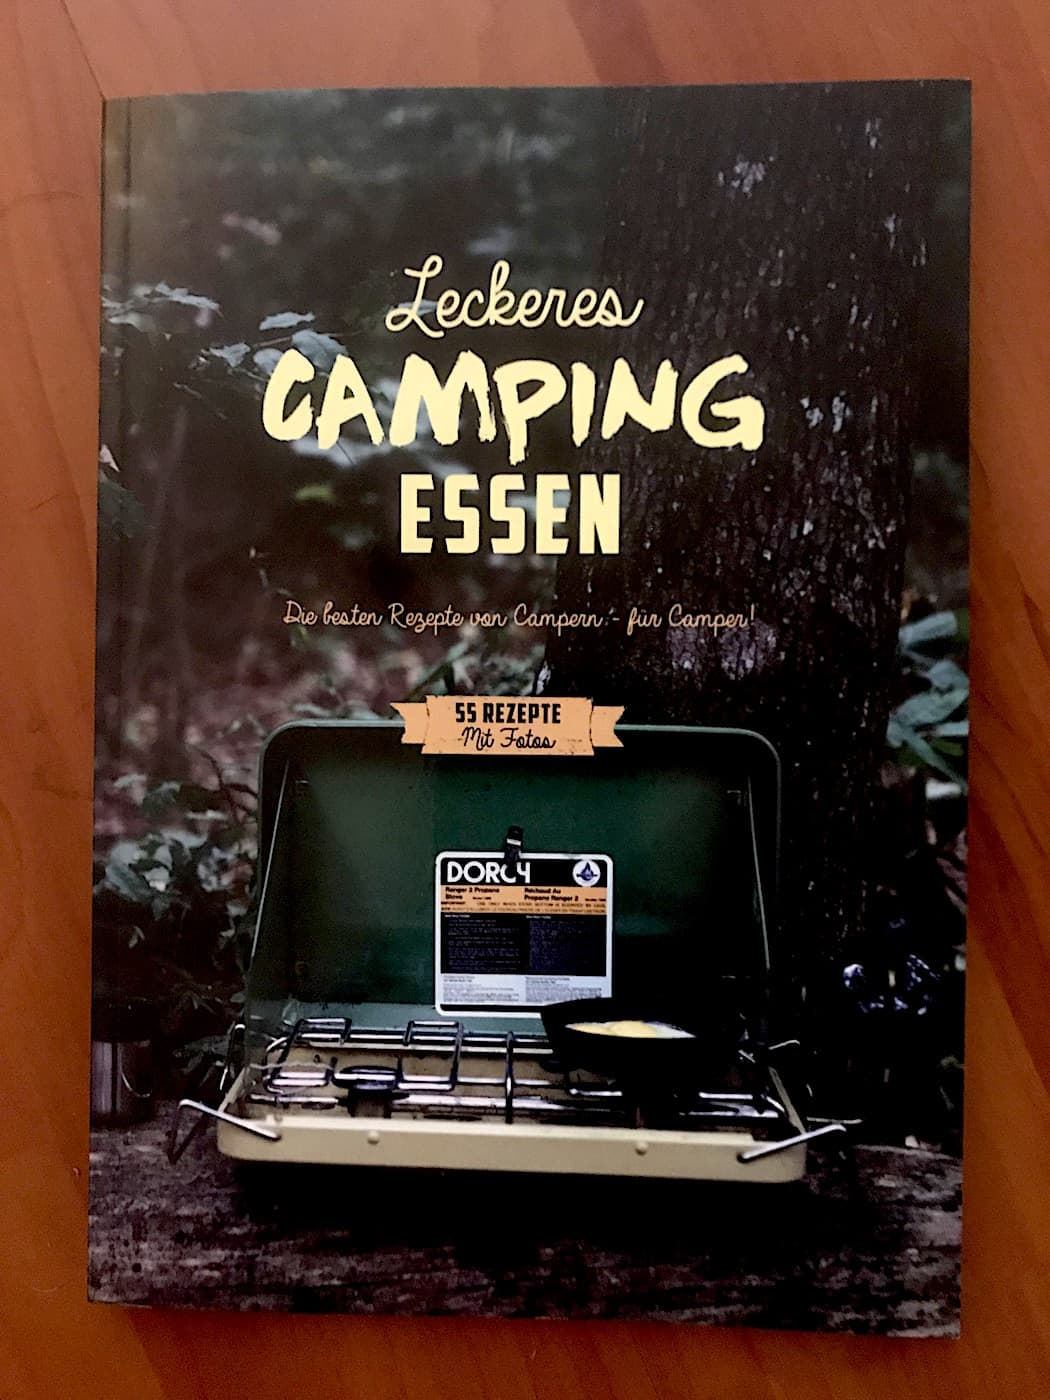 Leckeres Camping Essen - Camping Kochbuch